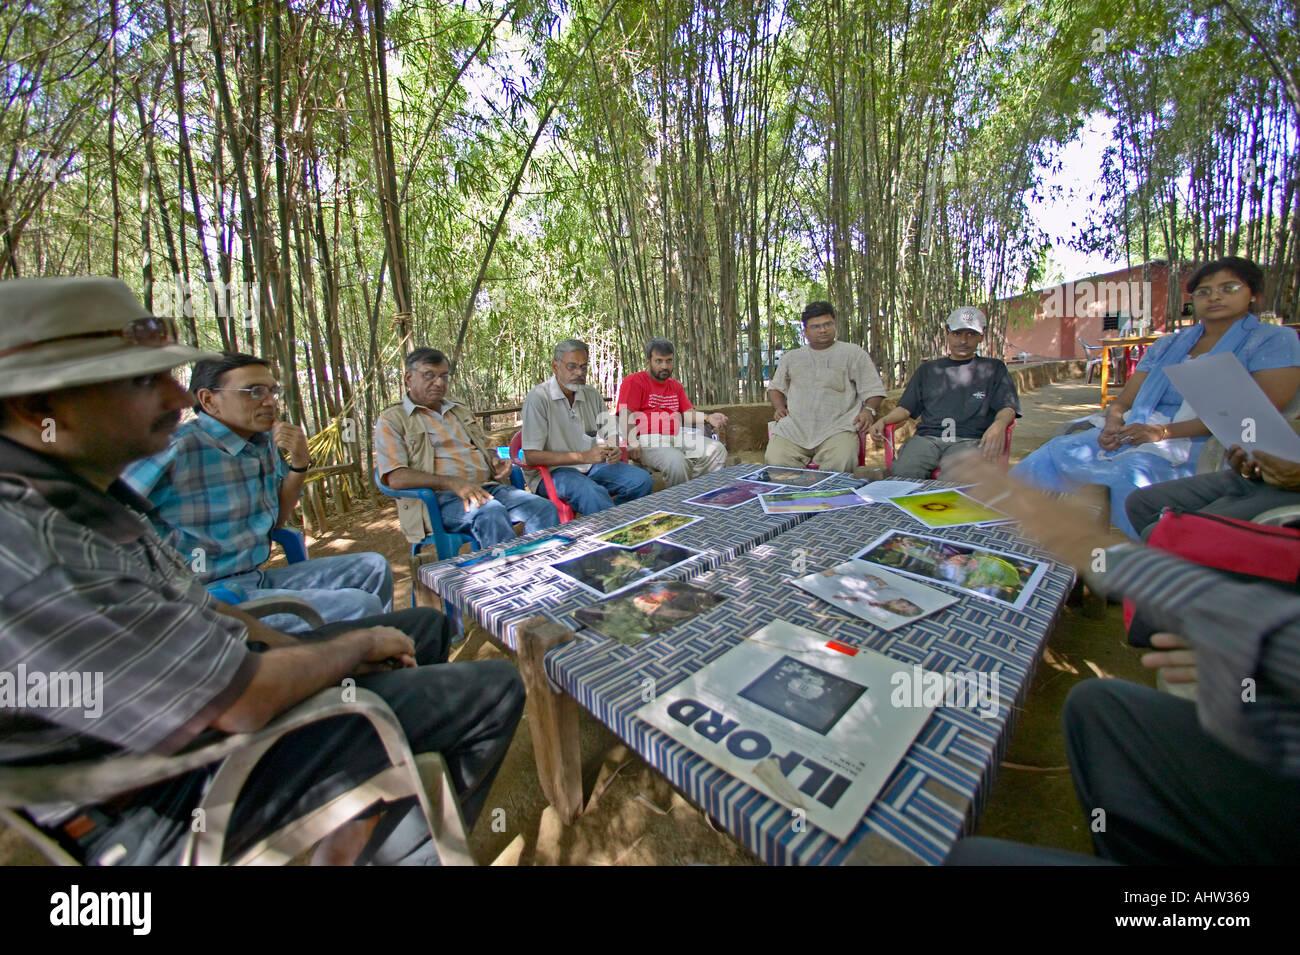 AAD 91600 Fotografia WorkShop creativi fotografi Dinodia discutendo arte Neral Maharashtra INDIA Foto Stock